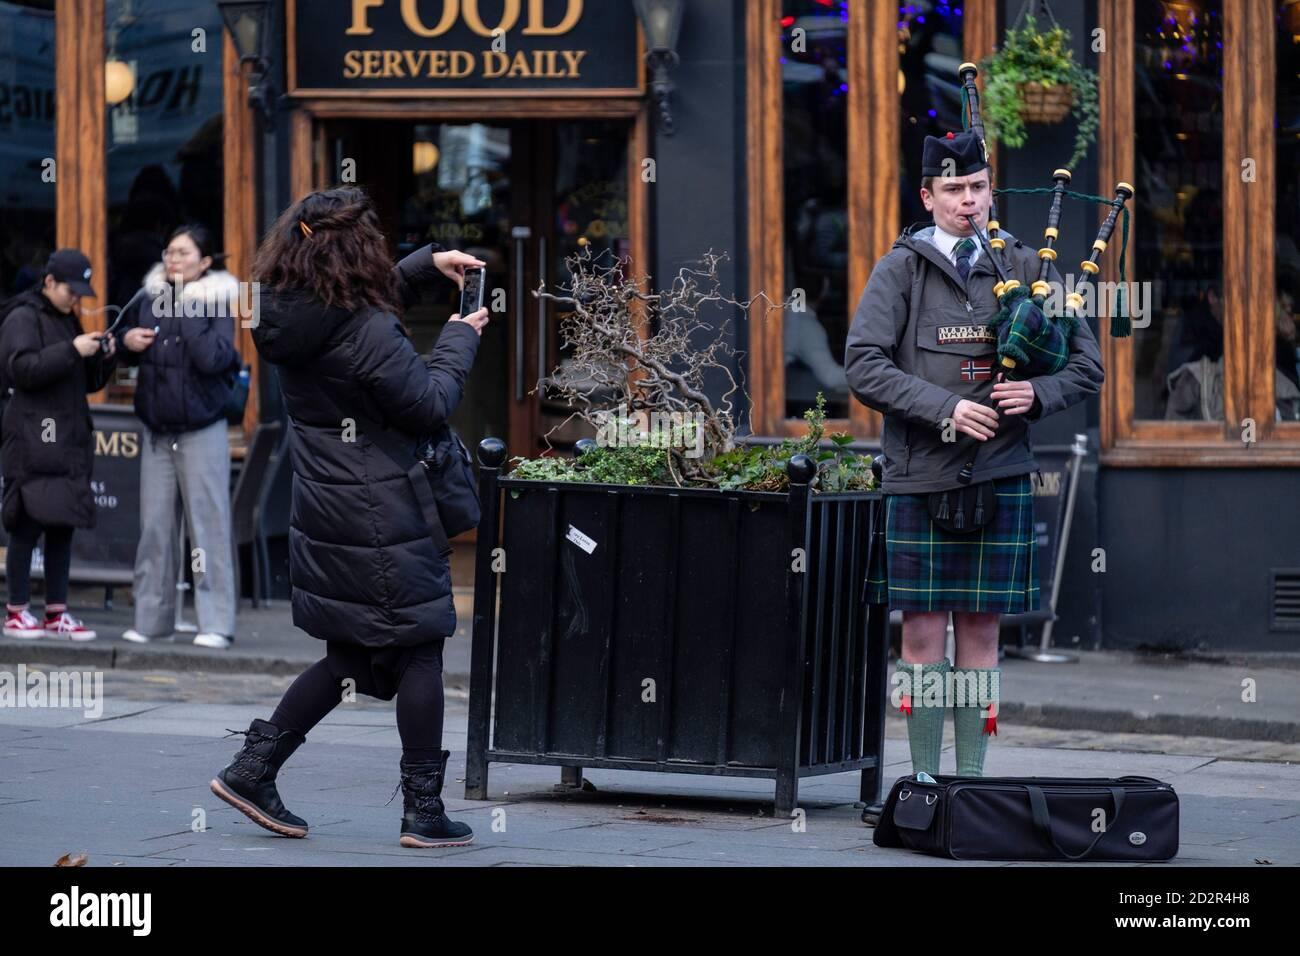 Gaitero escocés, Edimburgo, Lowlands, Escocia, Reino Unido Foto de stock